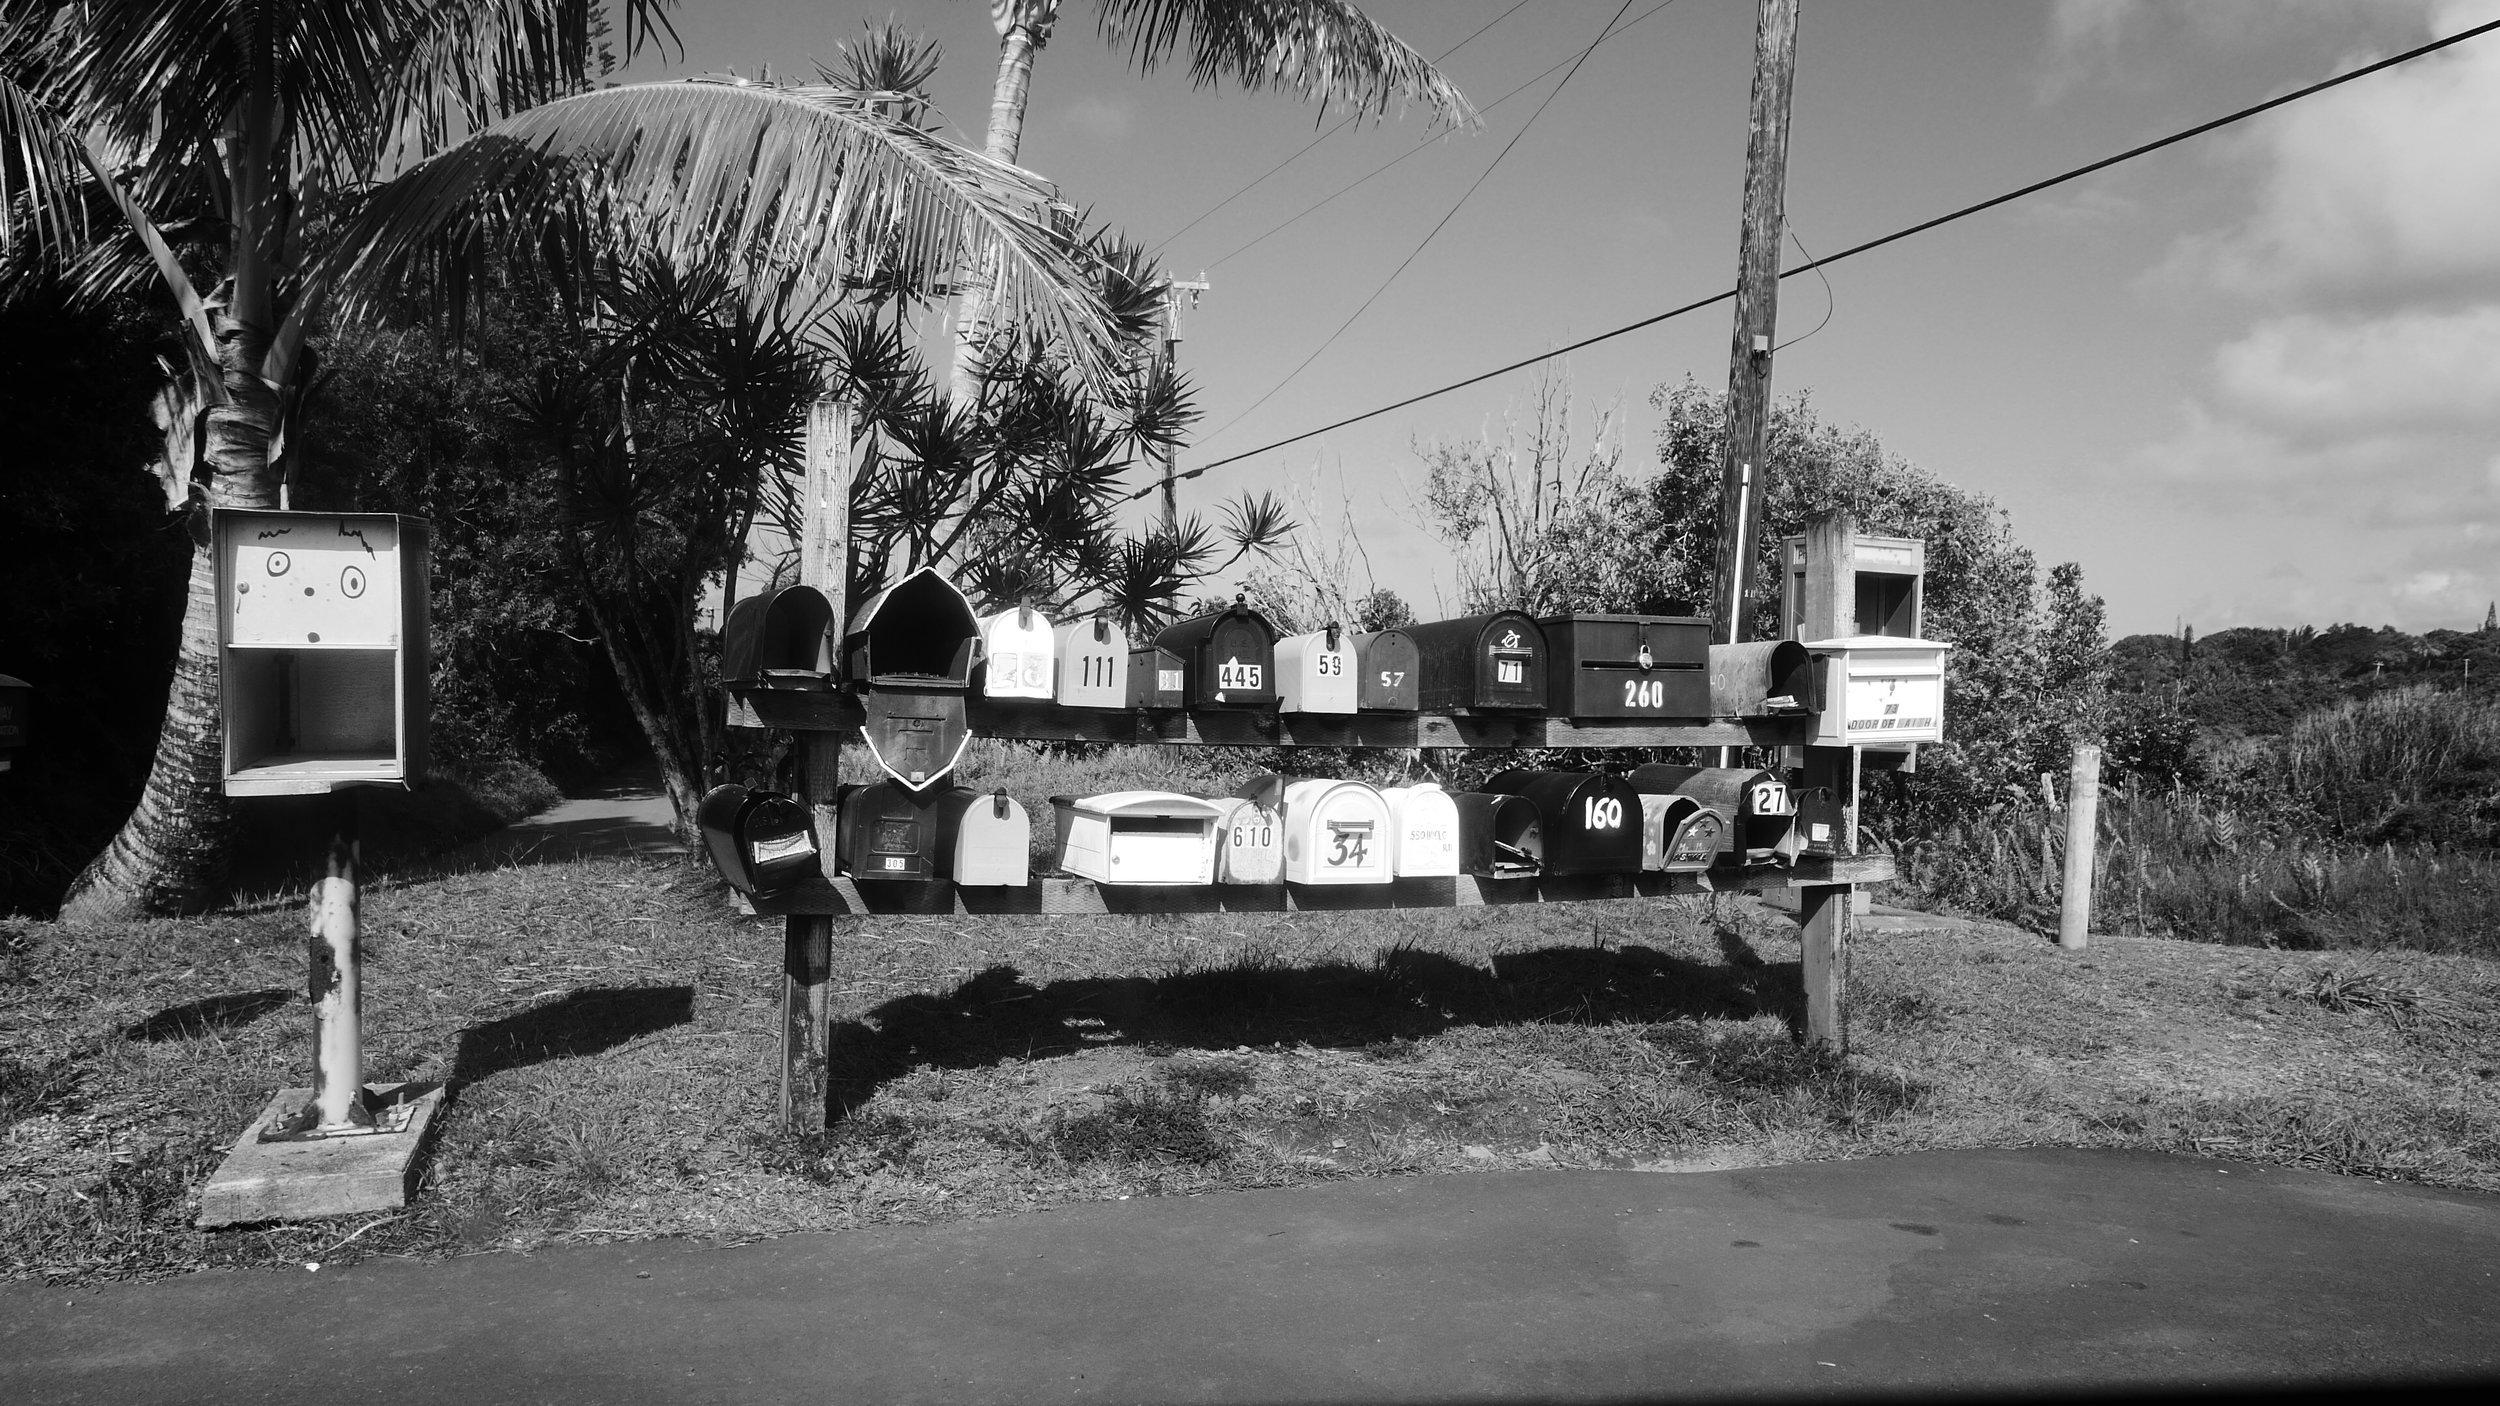 Mailboxes on Maui, Hawaii